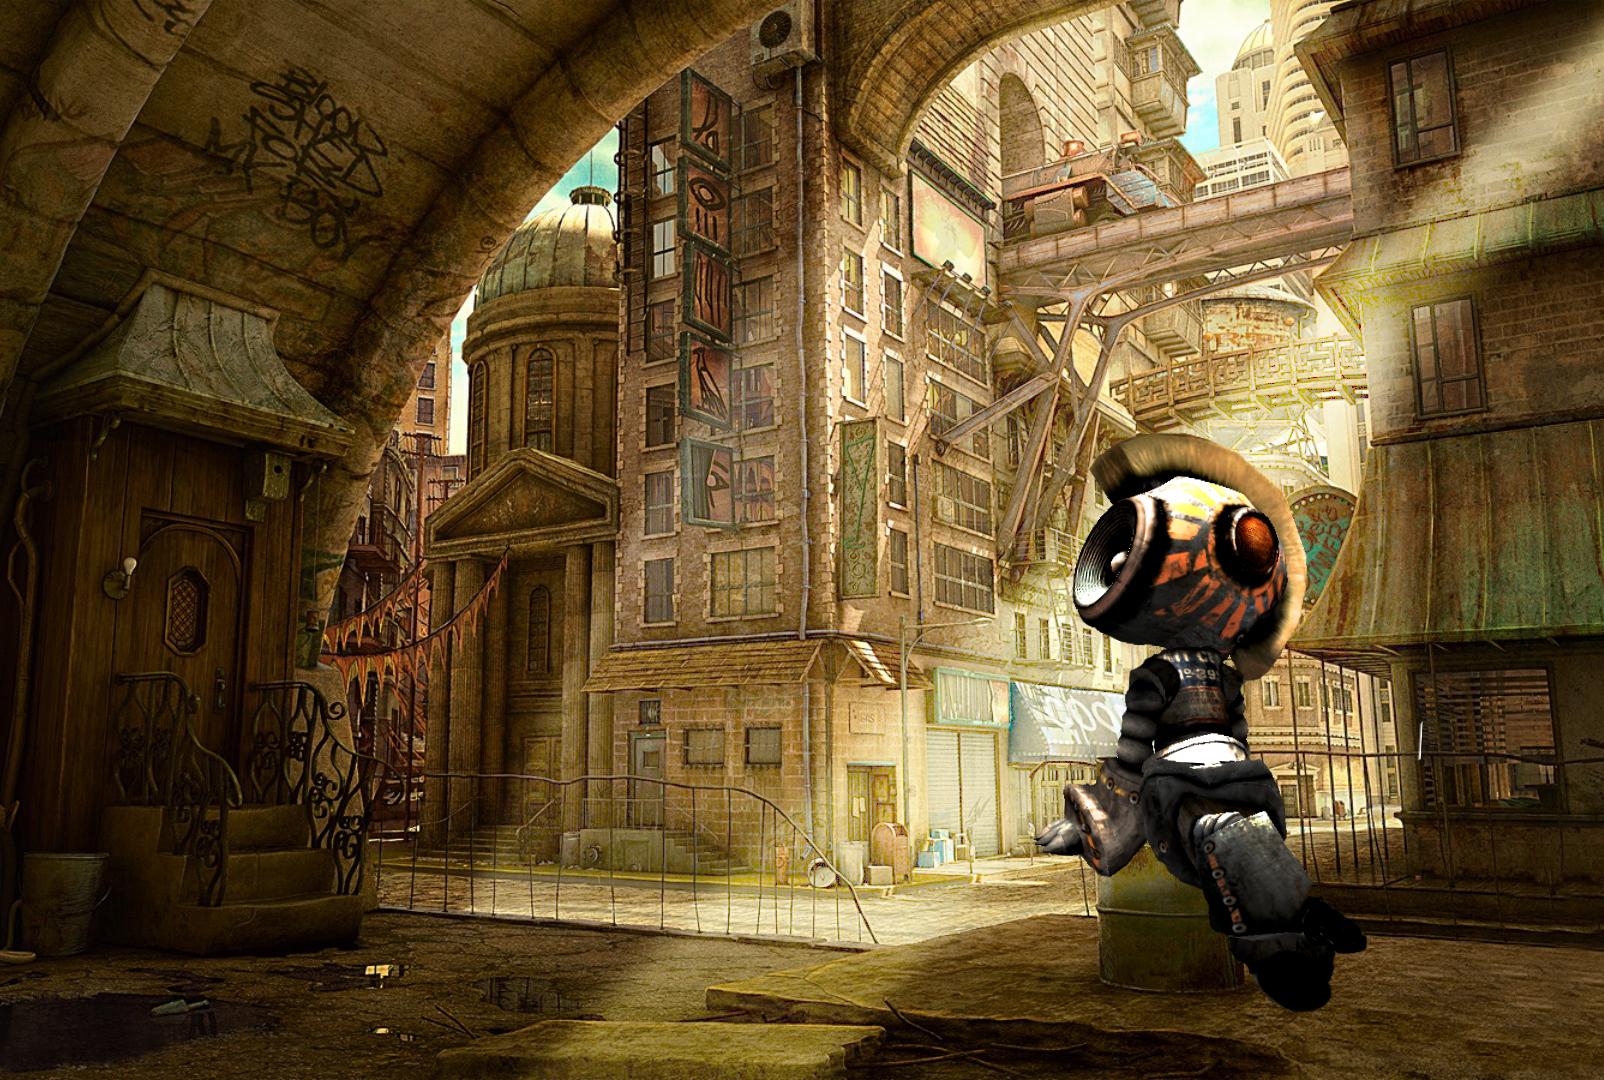 Wallpaper : robot, building, roleplay, games, screenshot